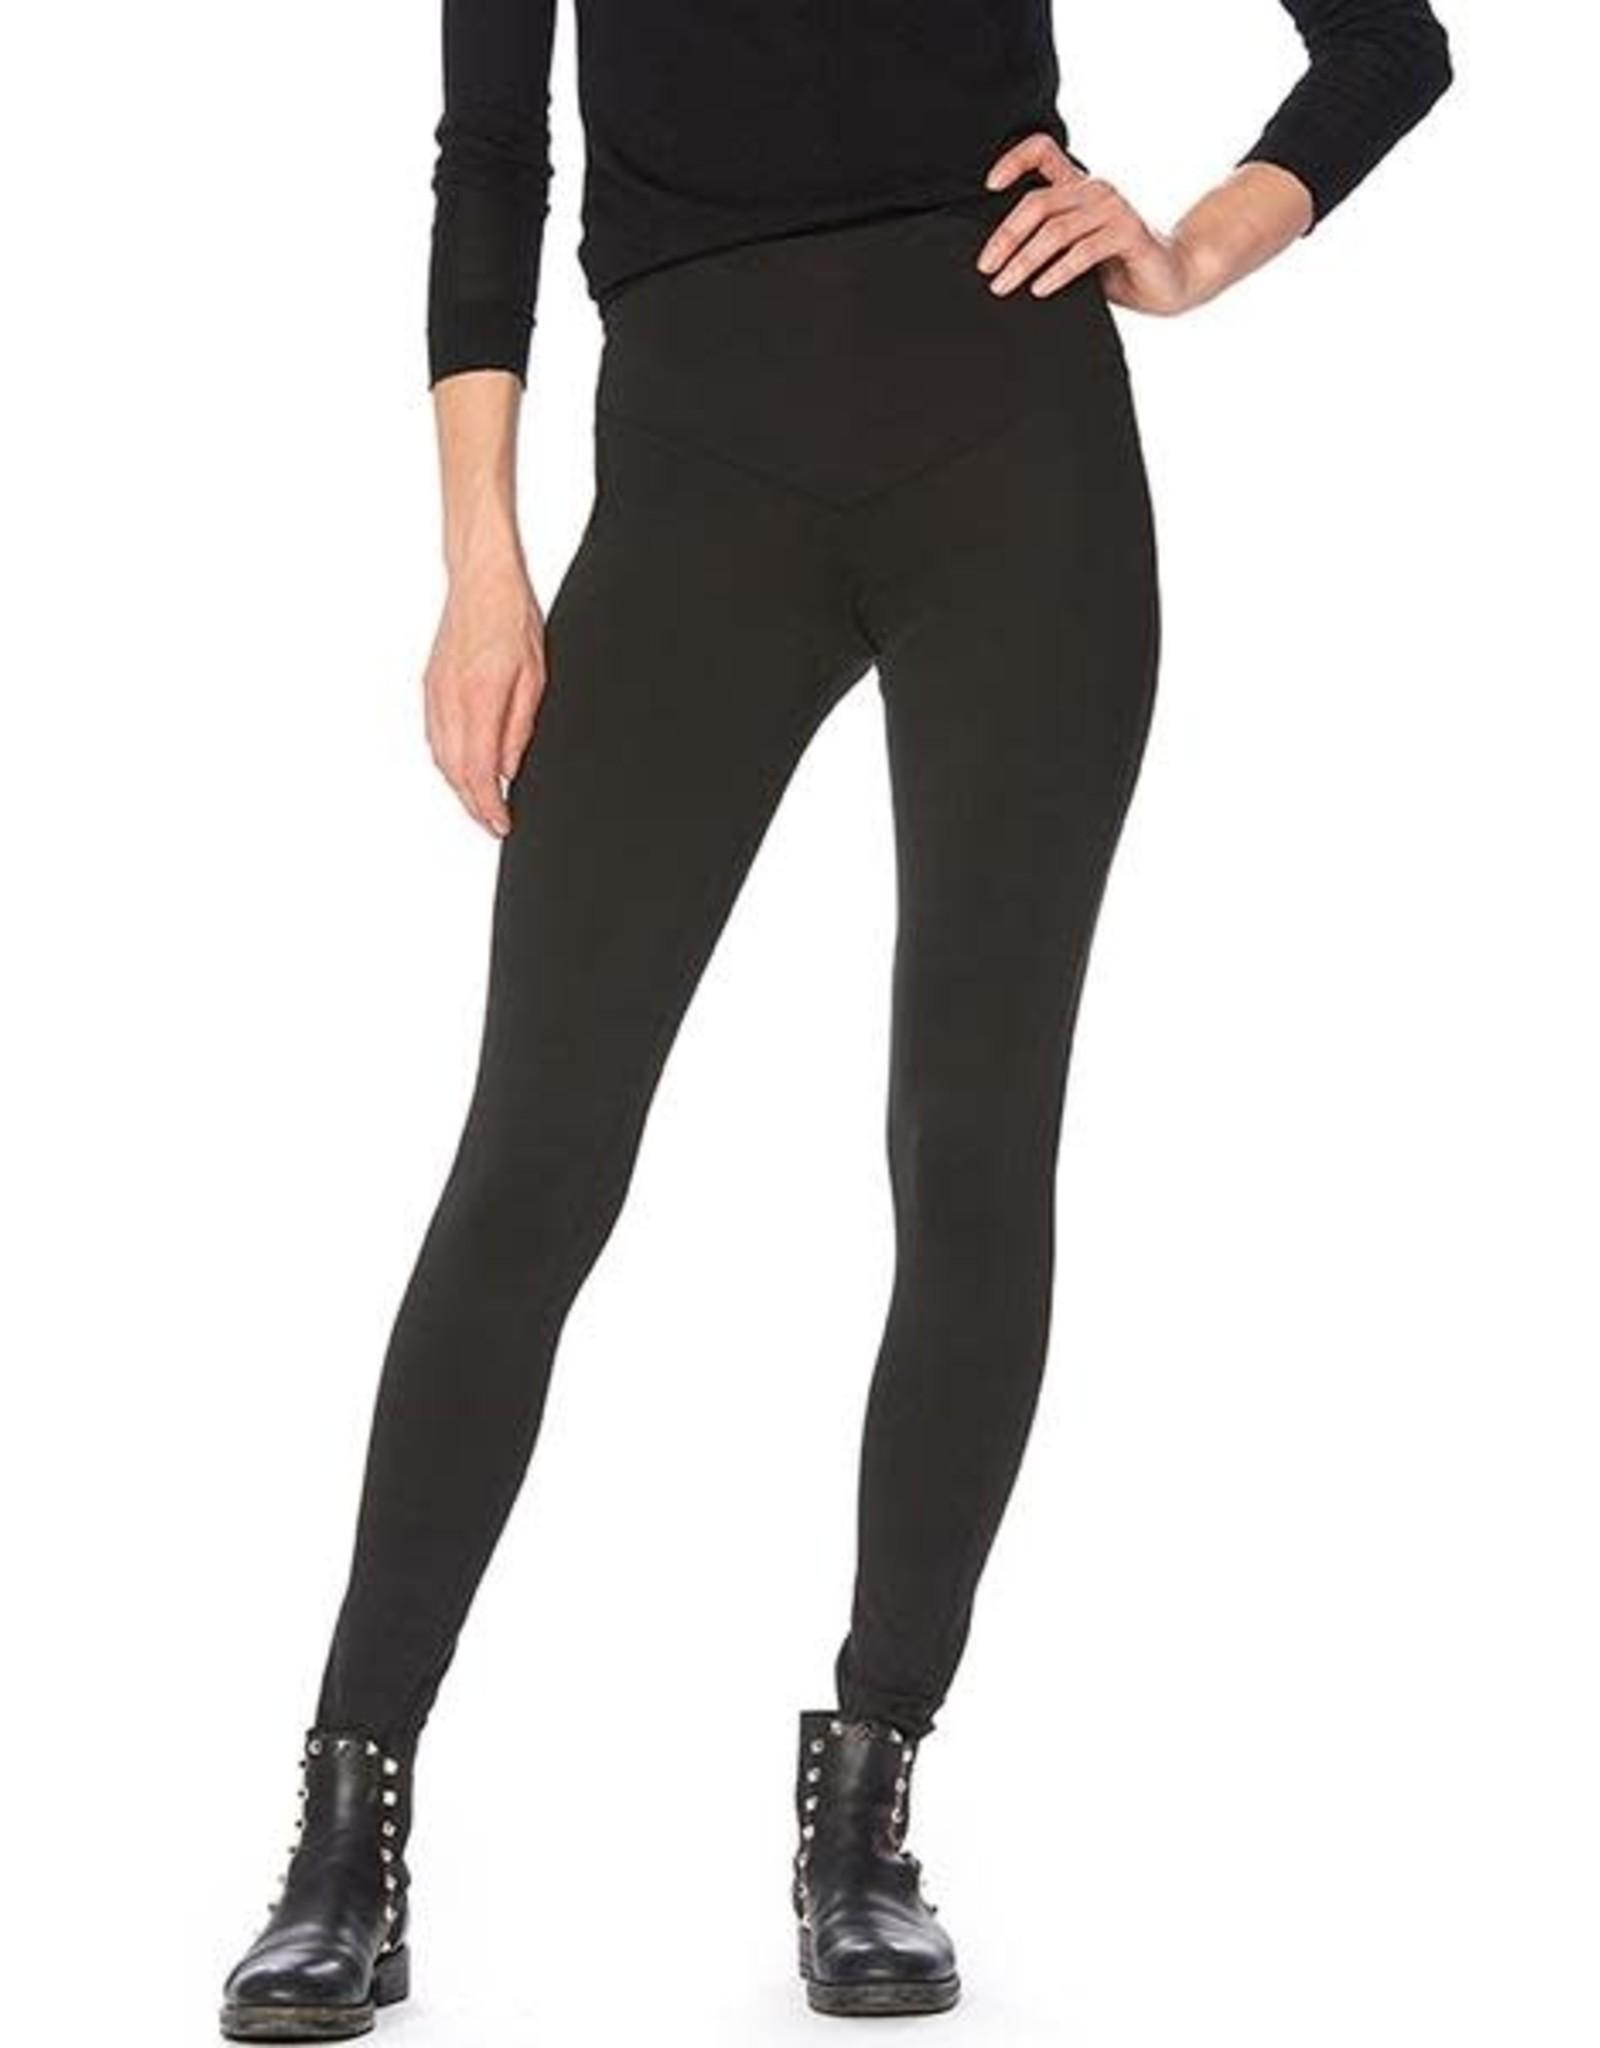 Hue Legging Taille Haute Super Smooth Tummy Control Hue 21785